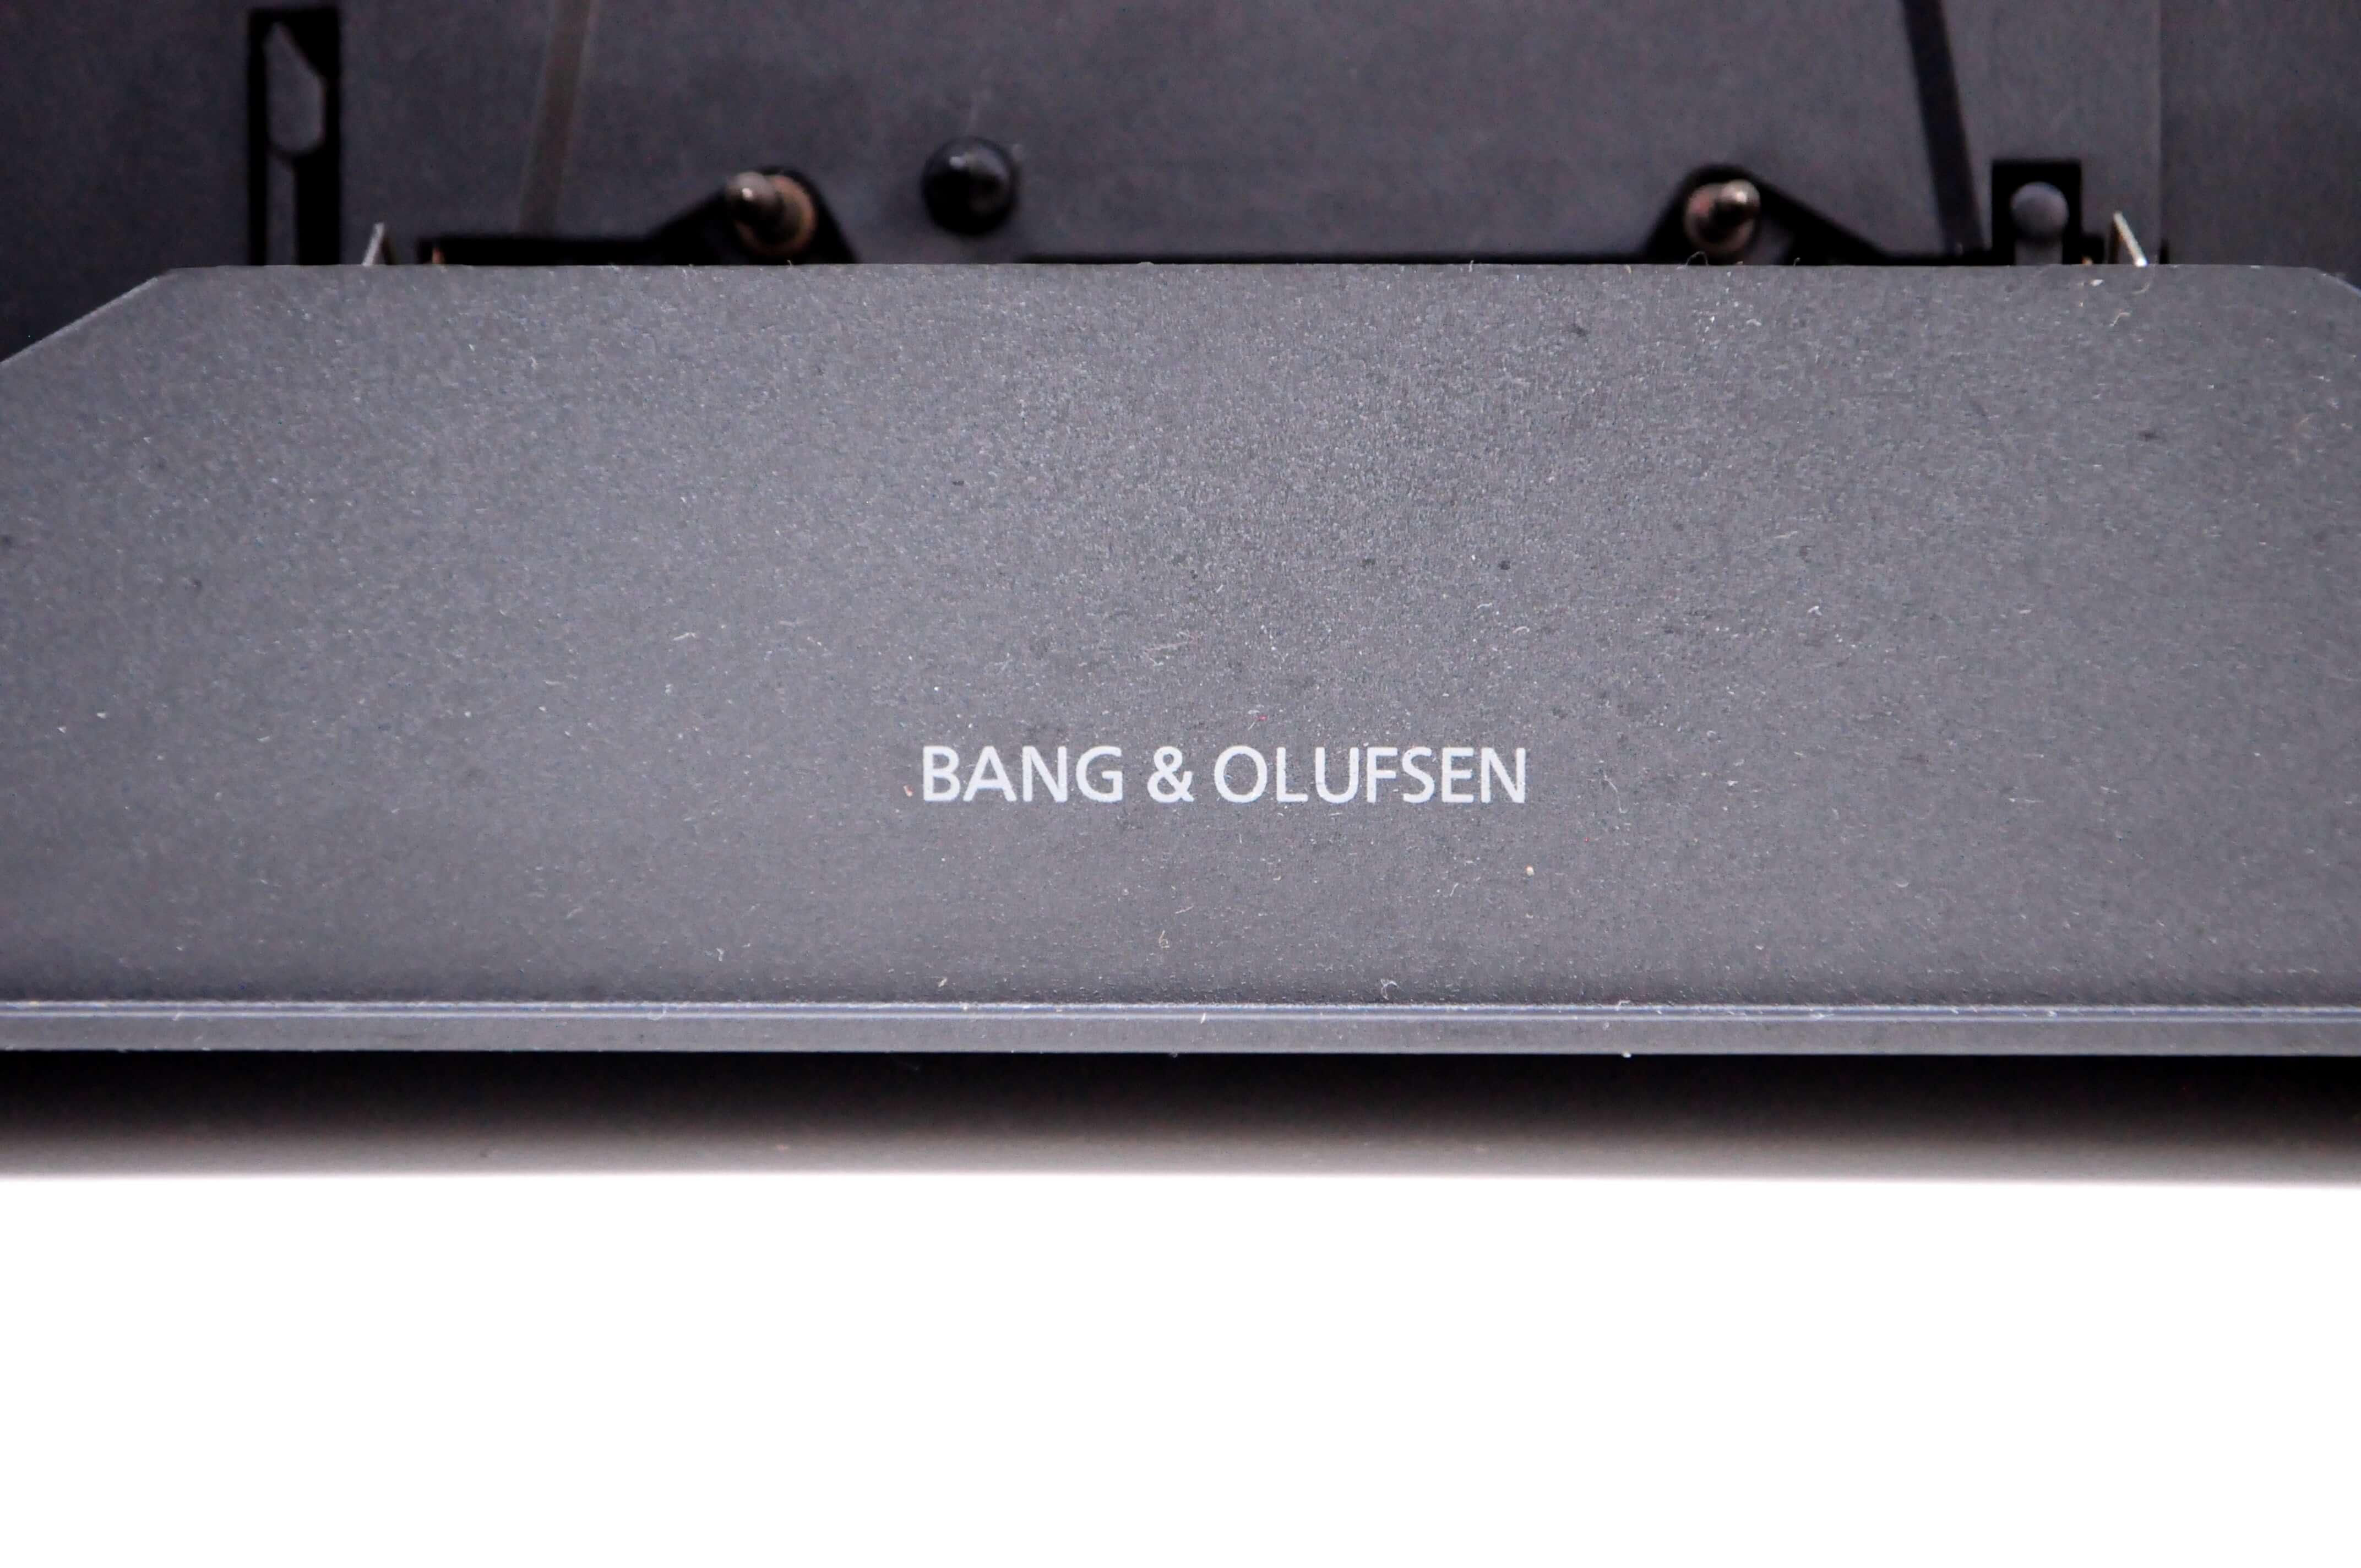 B&O Bang & Olufsen Beosound Century Made in DENMARK / バング アンド オルフセン デザイン オーディオ デンマーク製